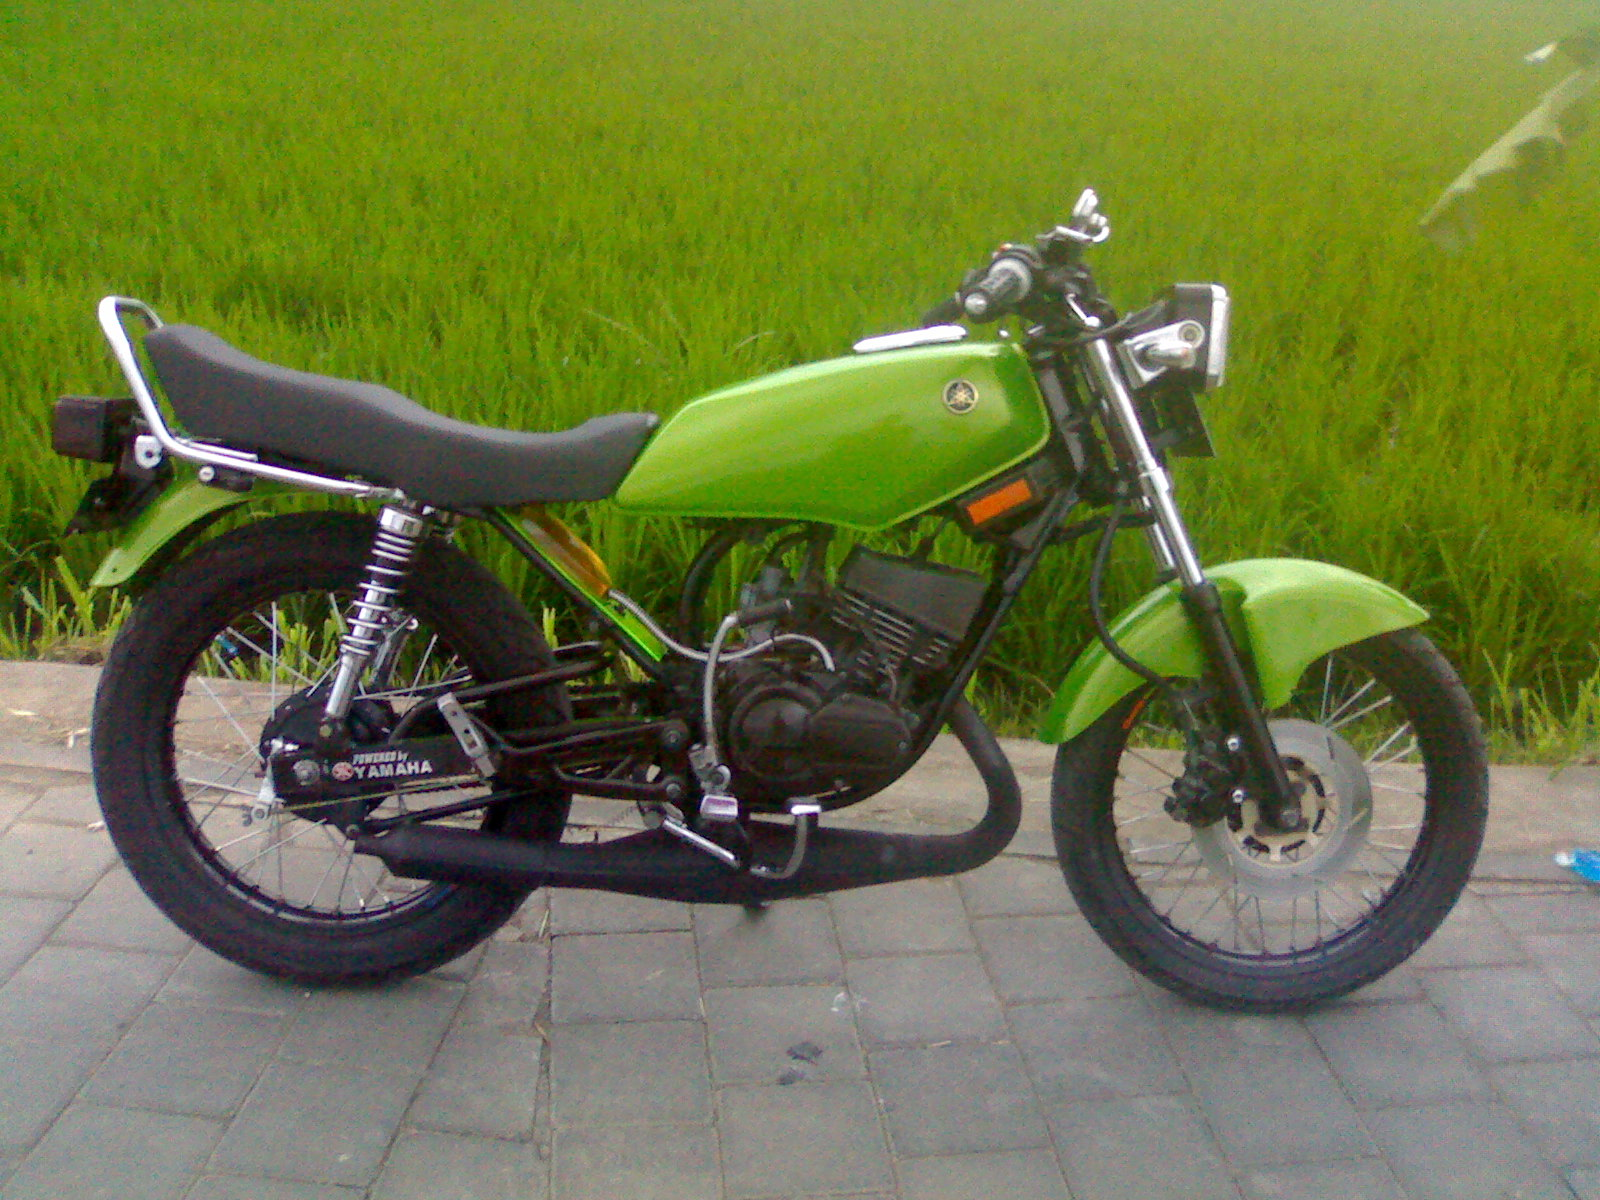 Yamaha RX King Modification